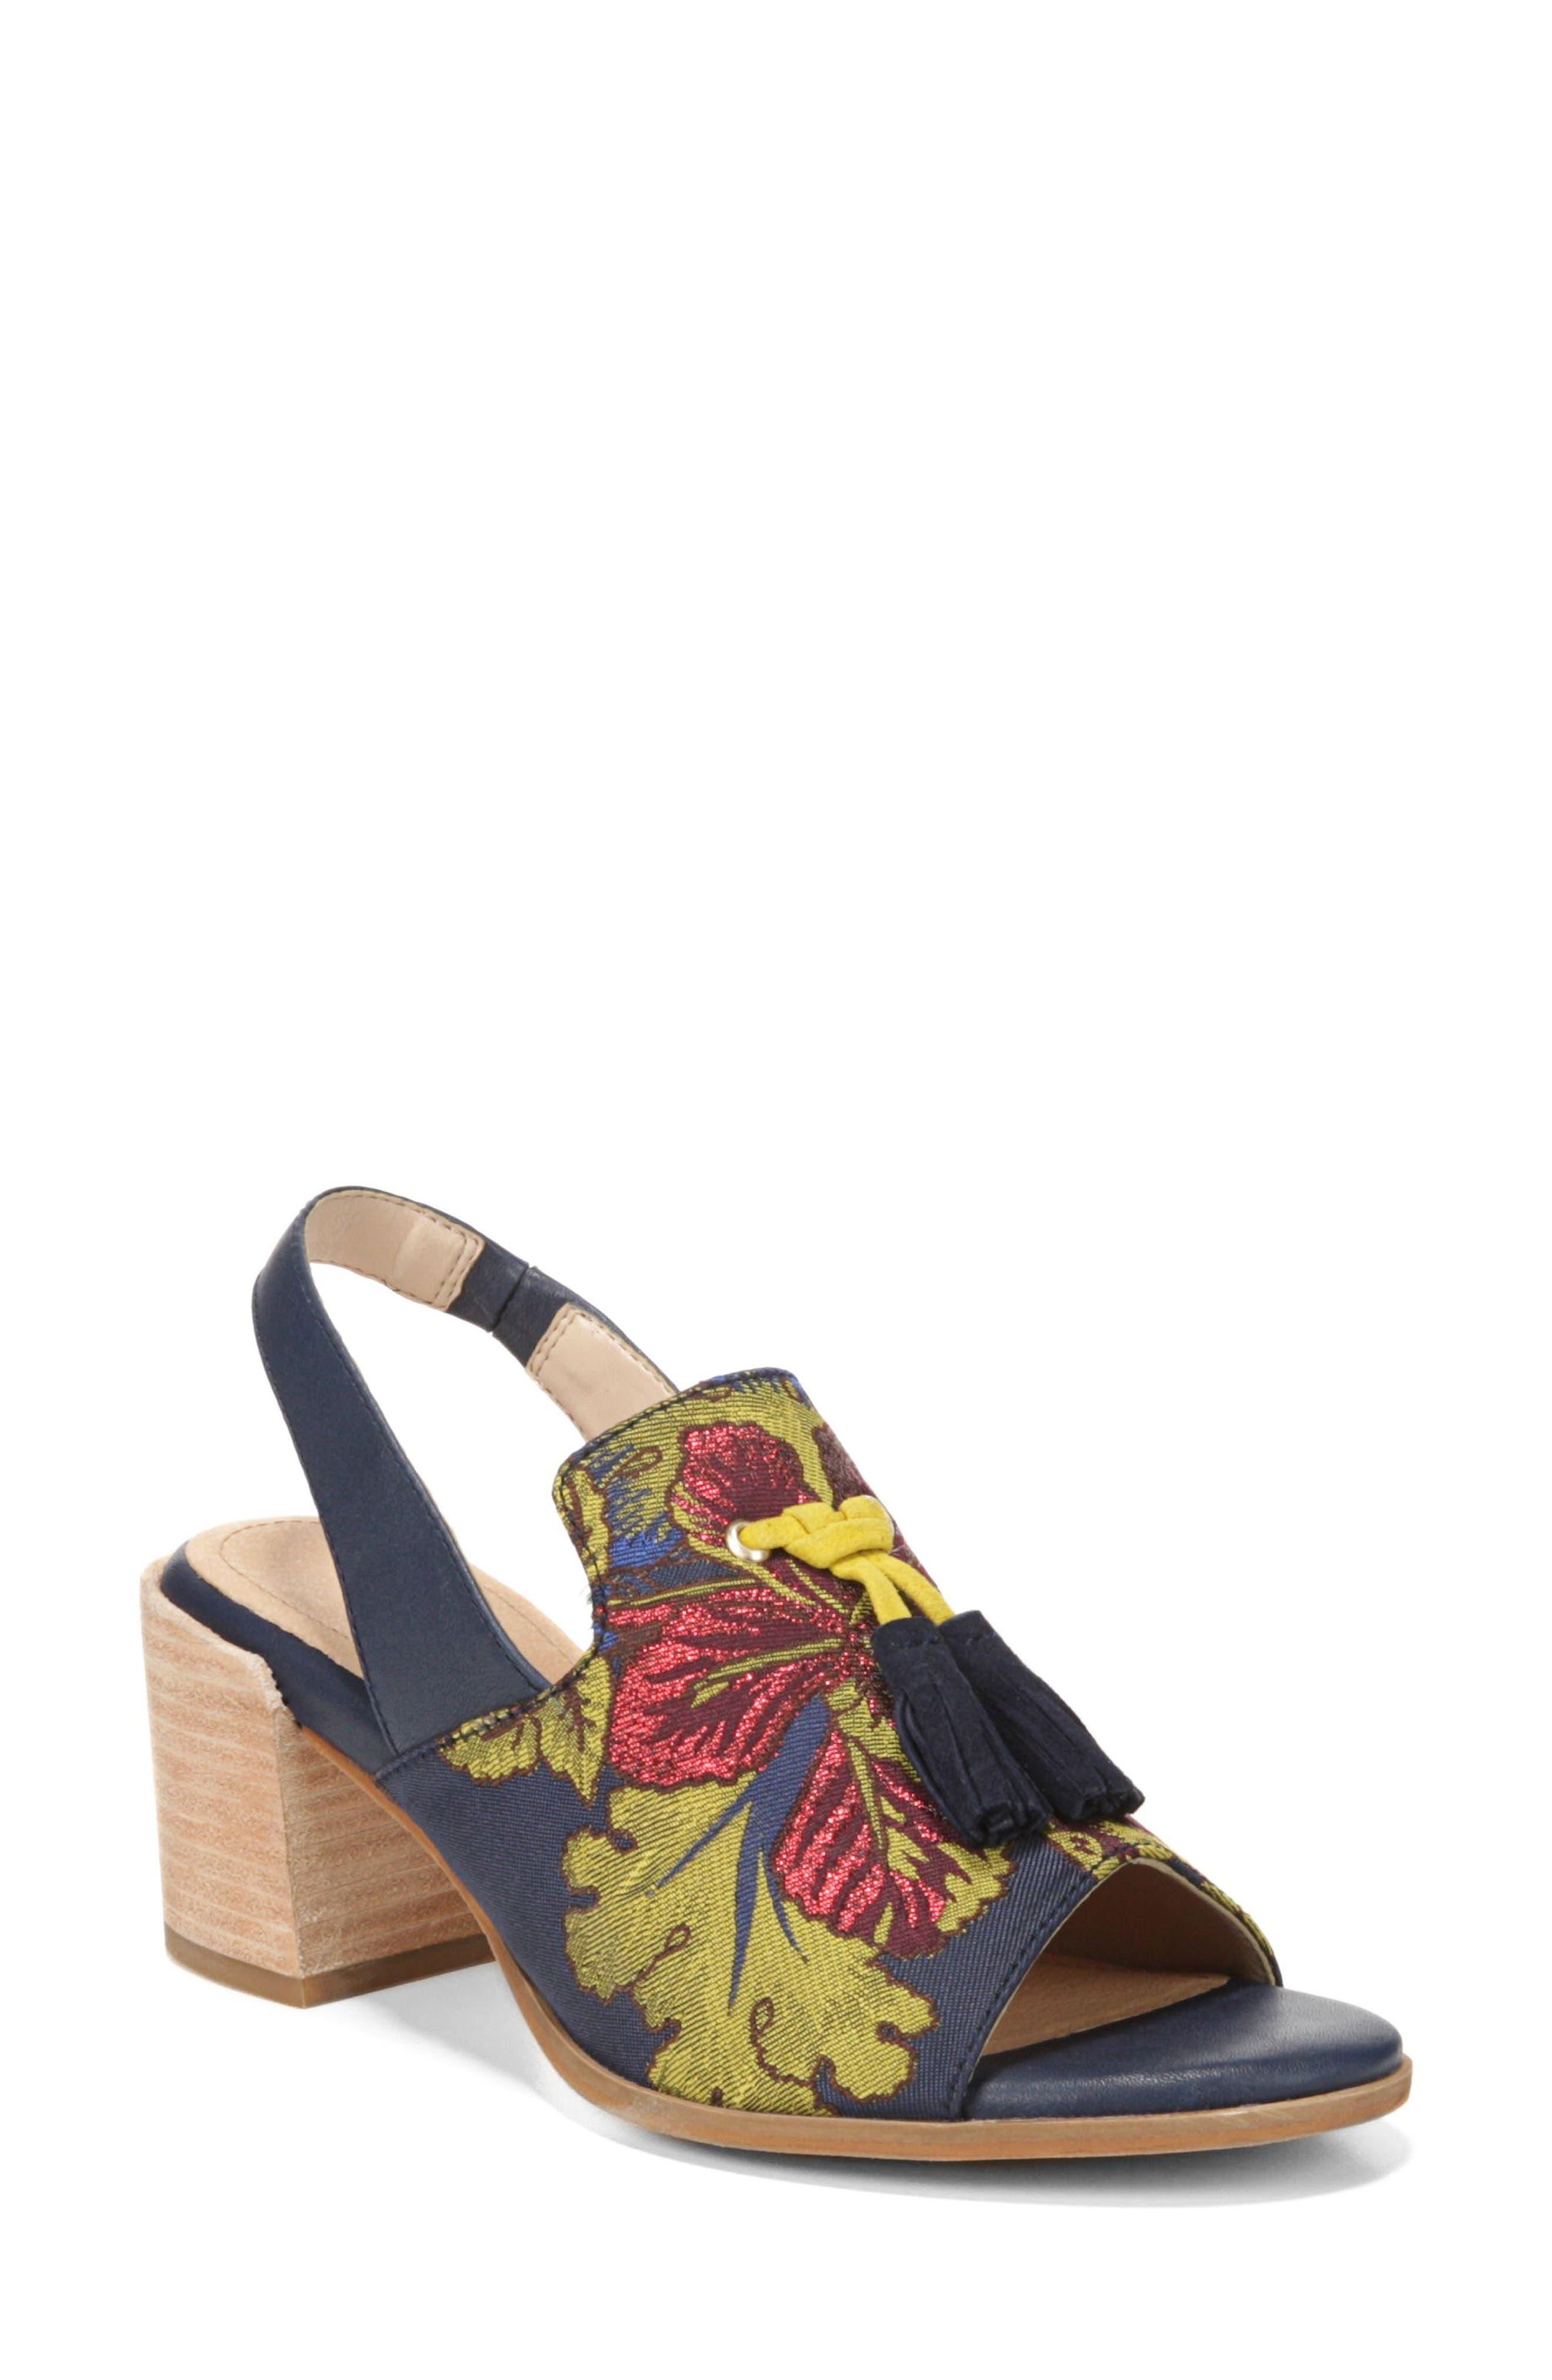 Main Image - Dr. Scholl's Meko Slingback Sandal (Women)